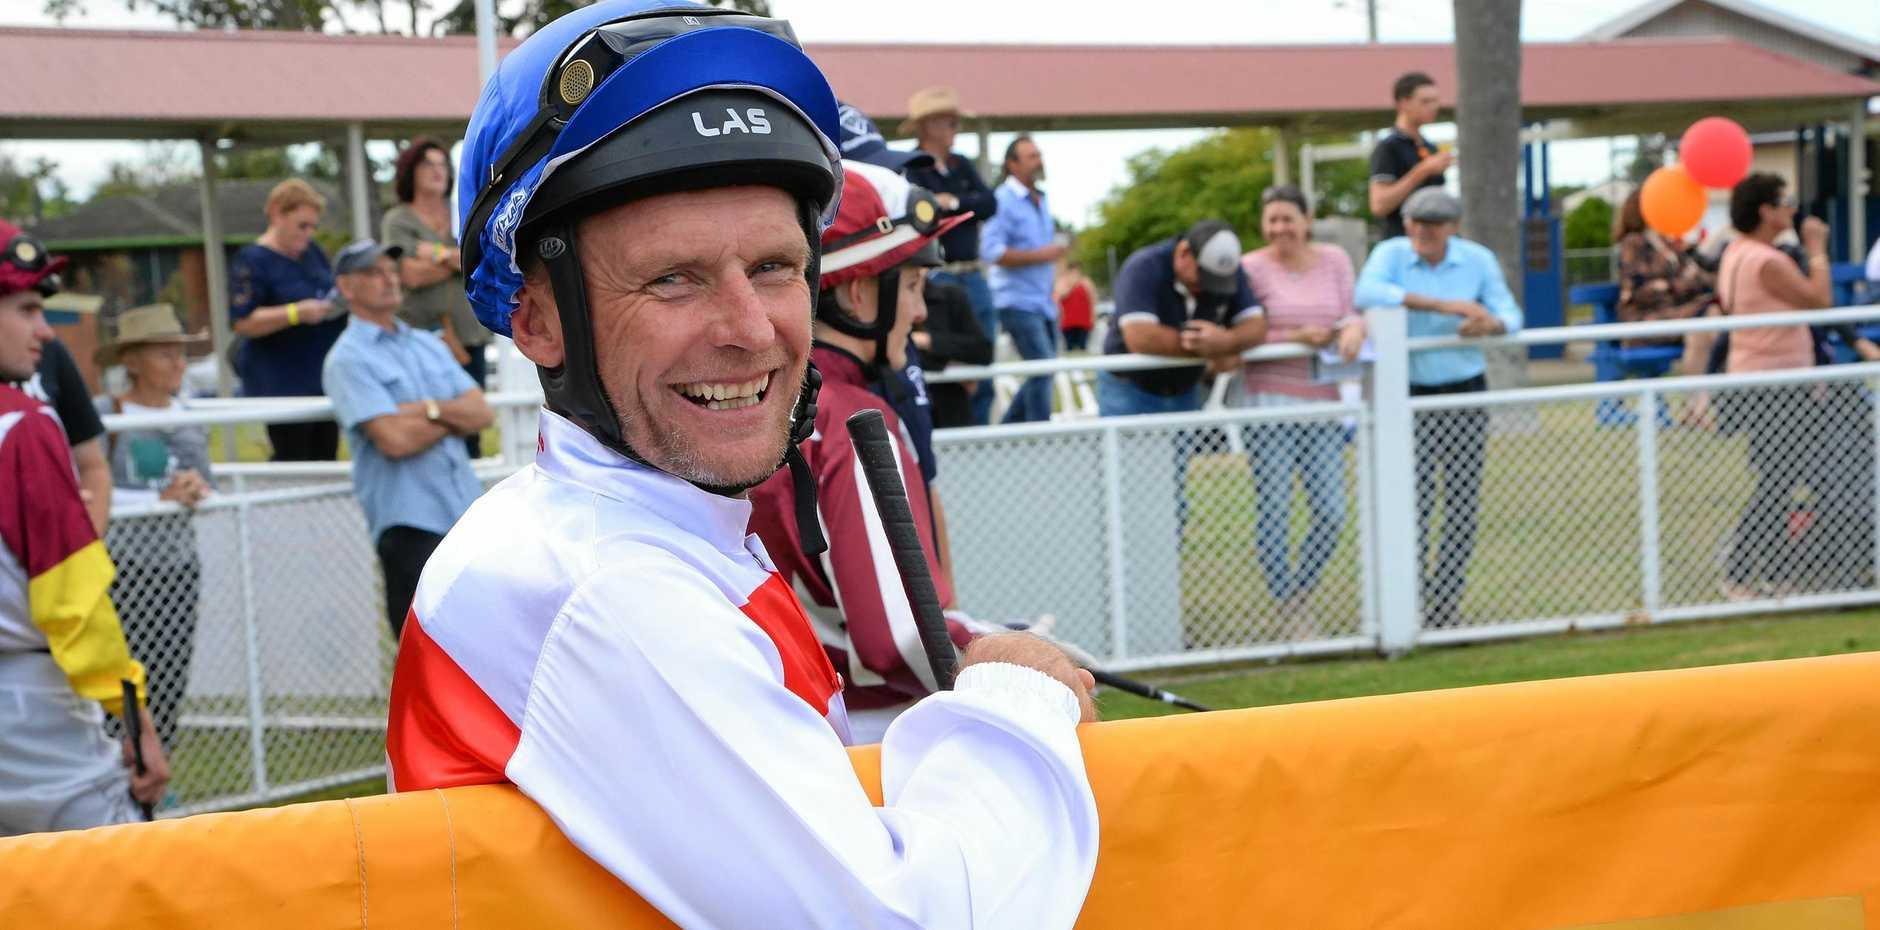 WIN GRIN: The larrikin smile of jockey Jasen Watkins is back at the track.